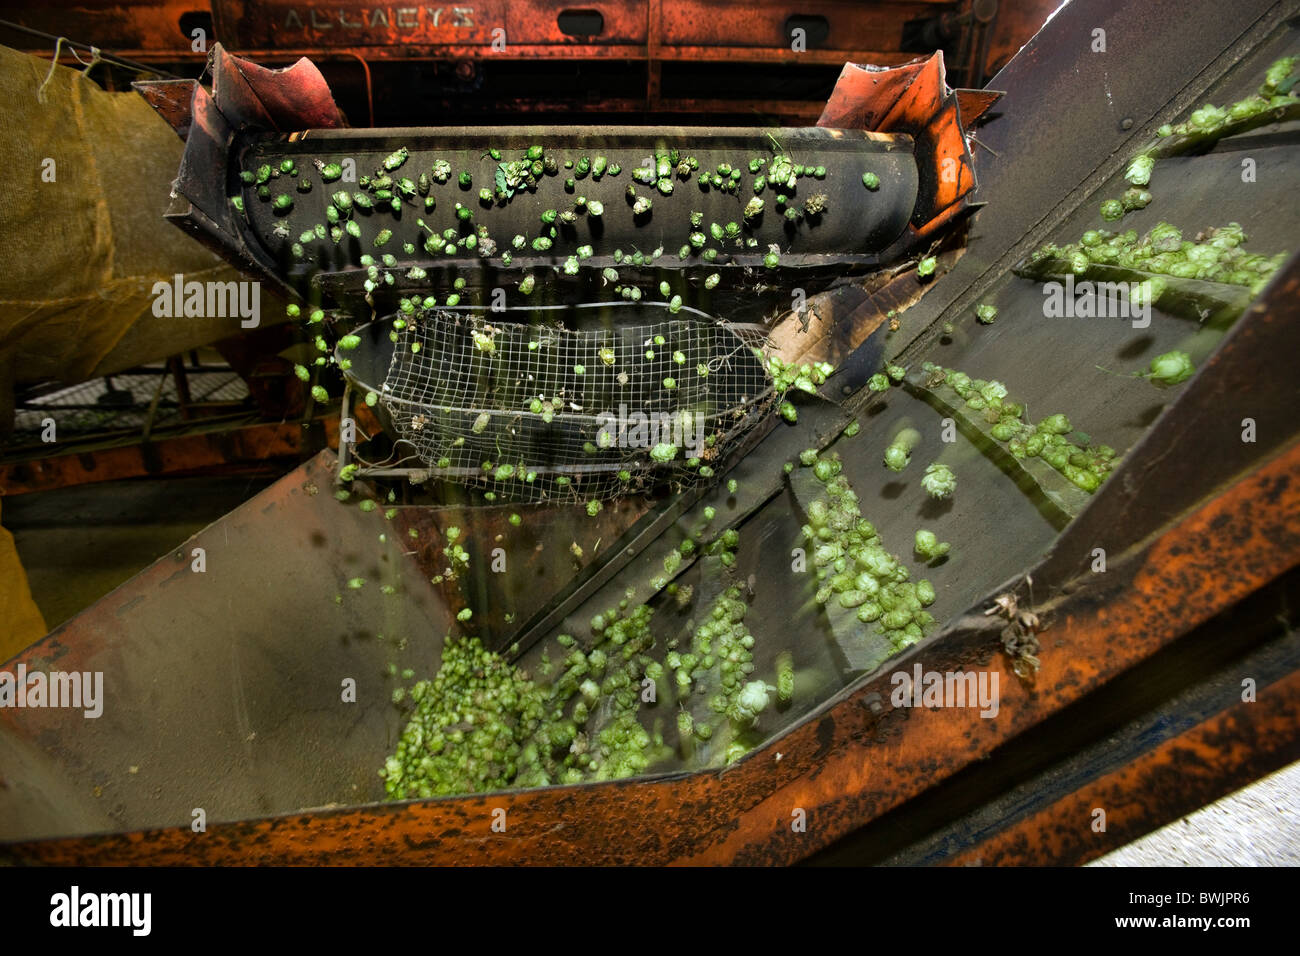 Production of hops (Humulus lupulus), Poperinge, Belgium - Stock Image